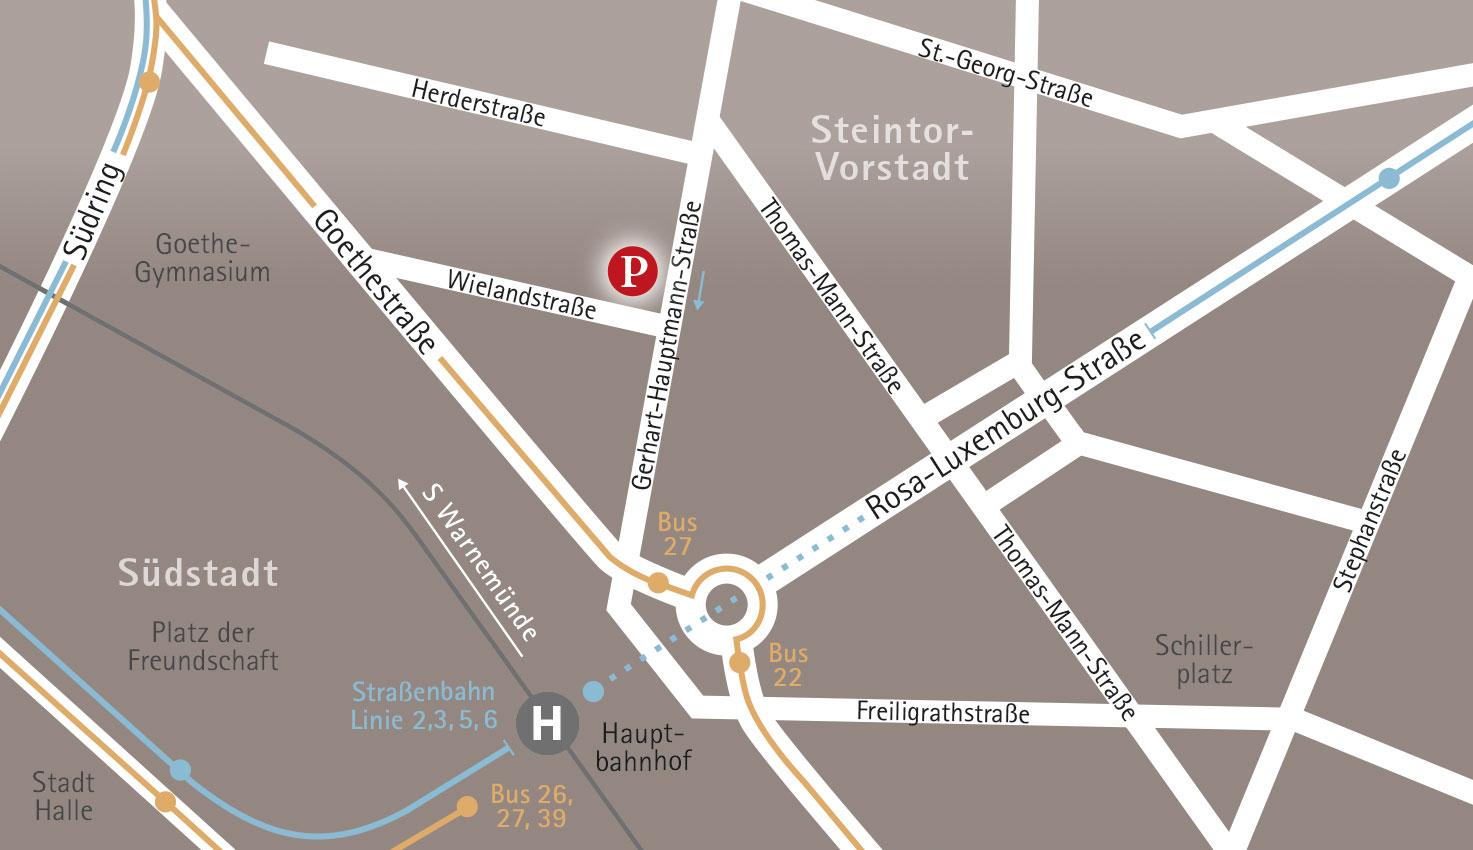 Anfahrt Puls Grafikdesign Rostock am Hauptbahnhof